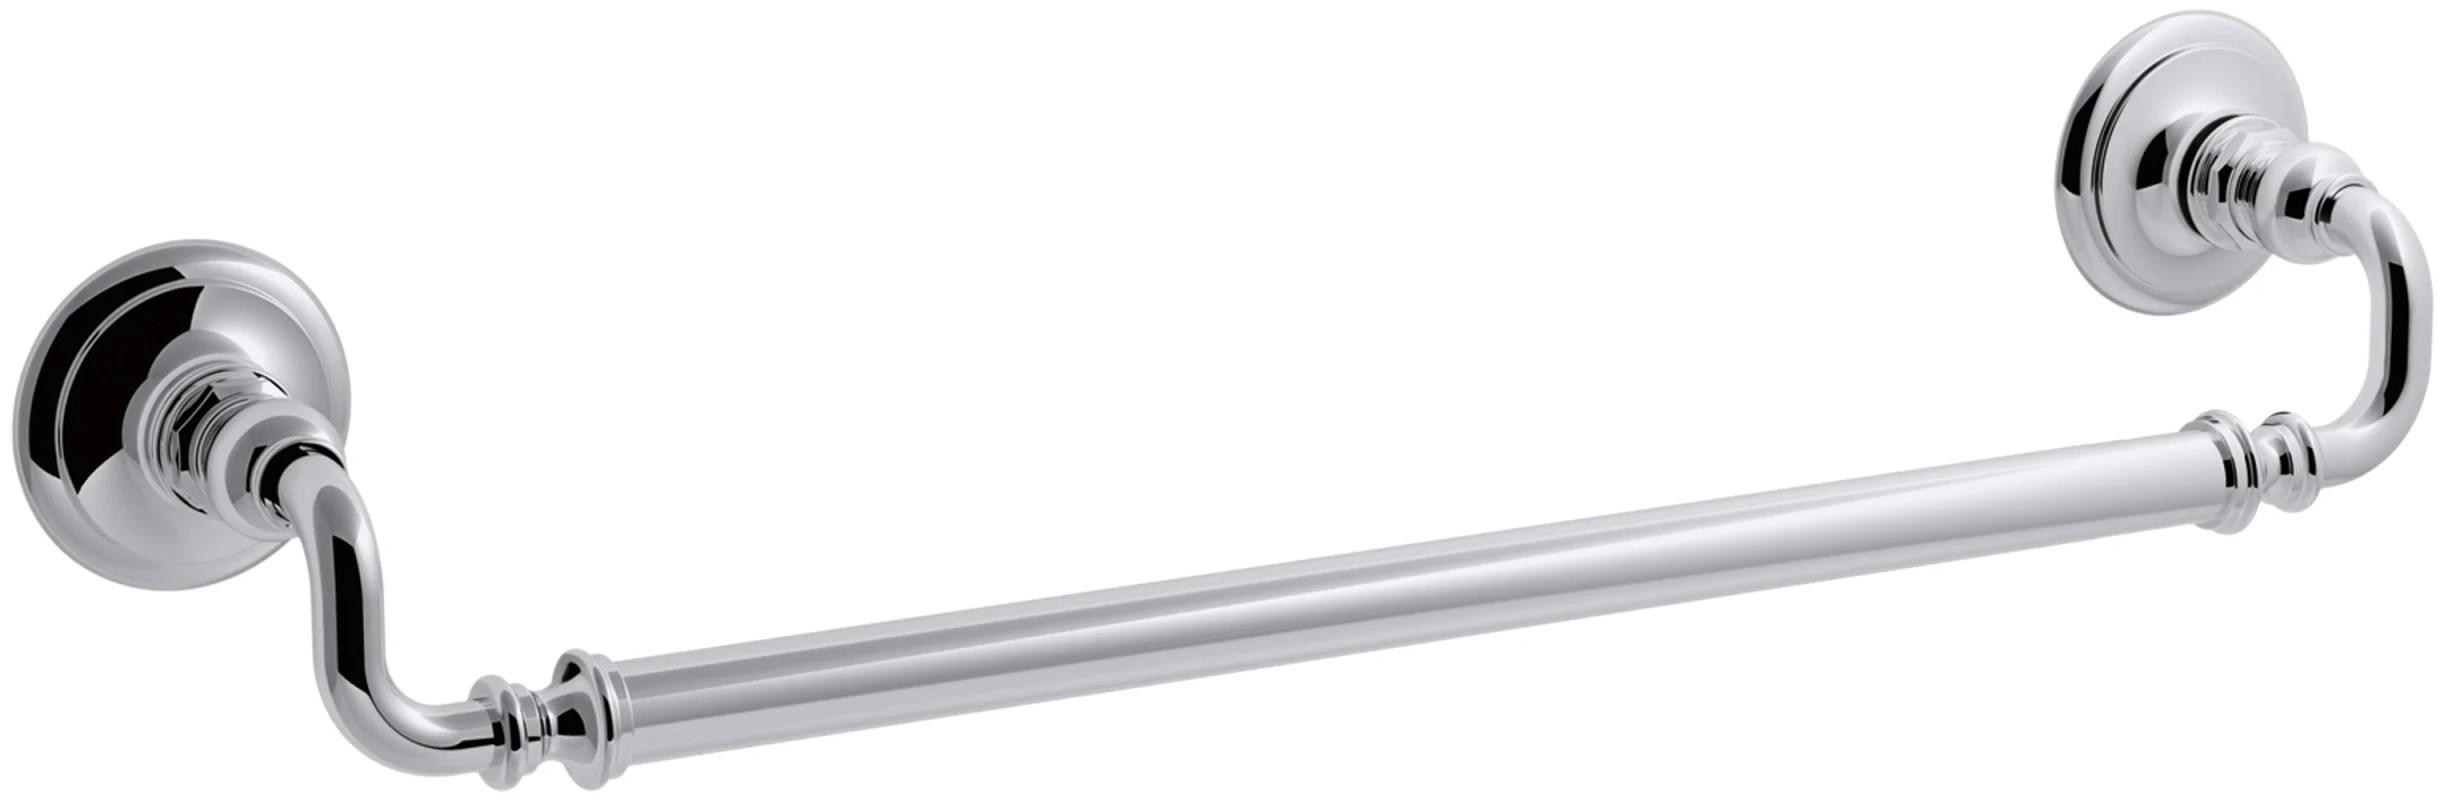 Kohler K Cp Polished Chrome Artifacts 18 Towel Bar